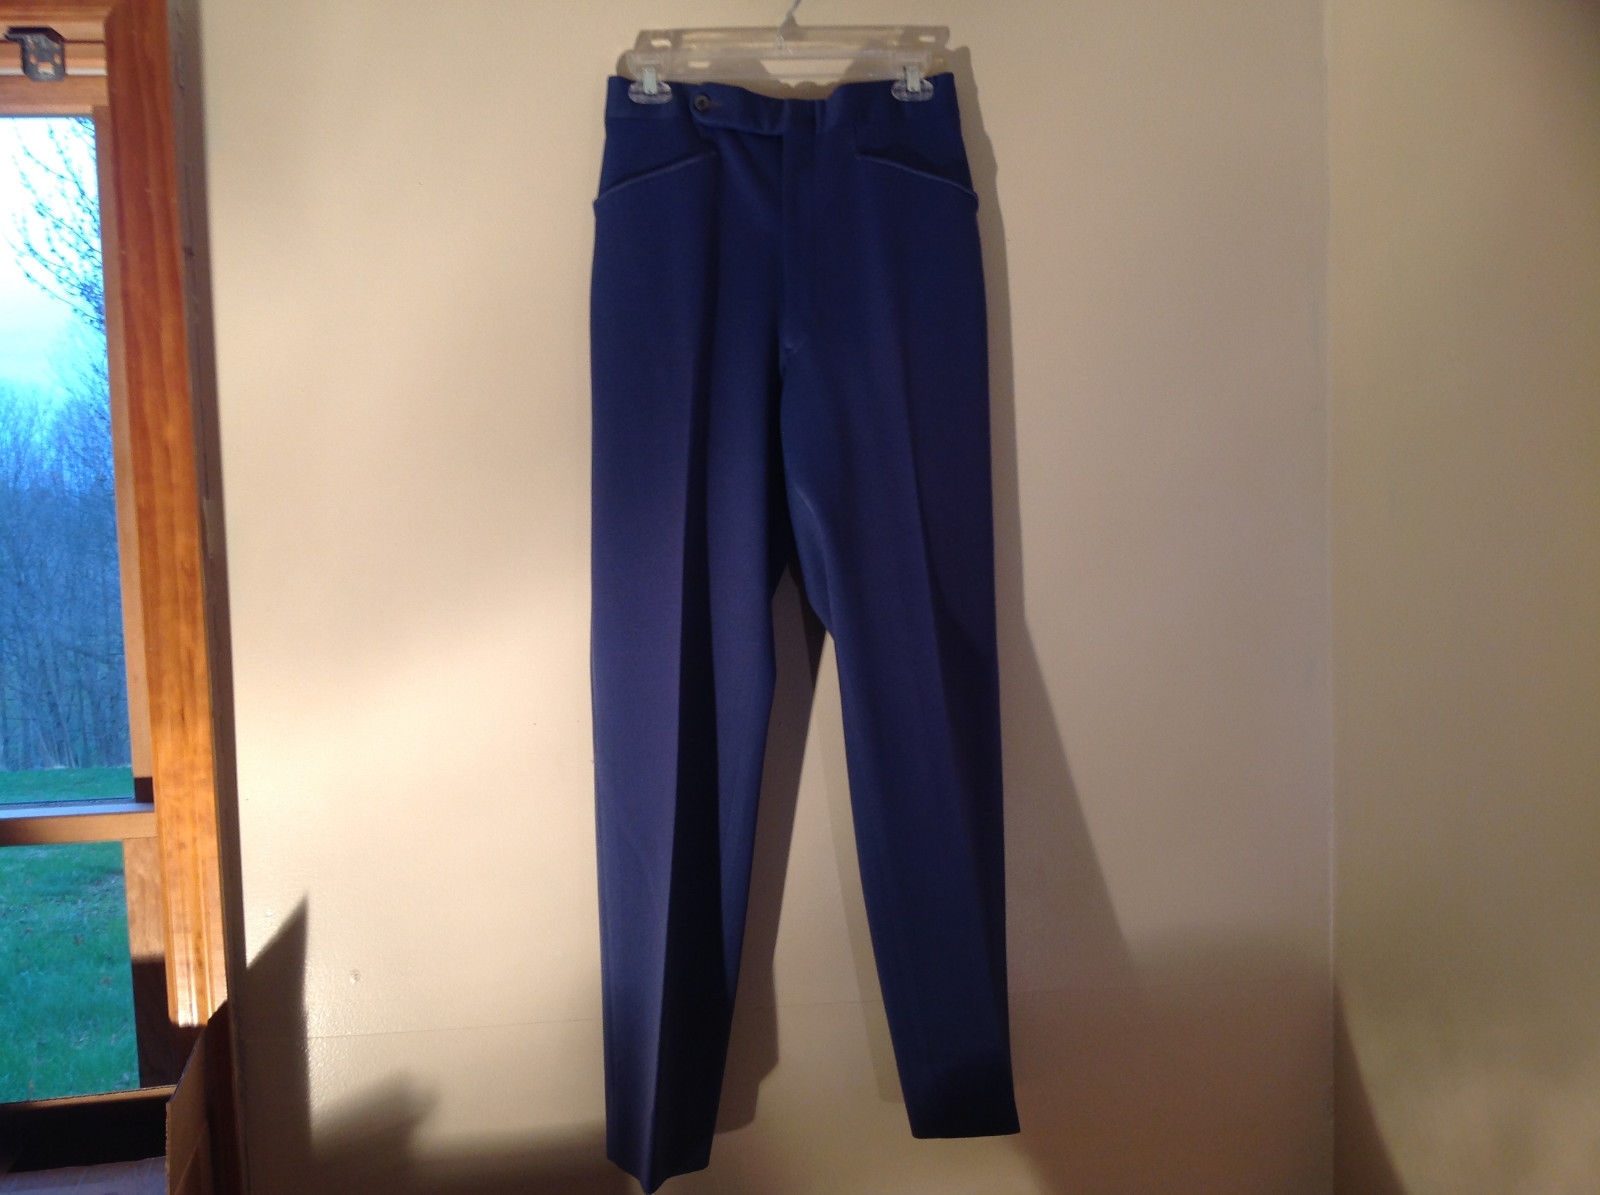 Blue Four Pocket Graham and Gunn LTD Dress Pants Zip Clasp Button Closure